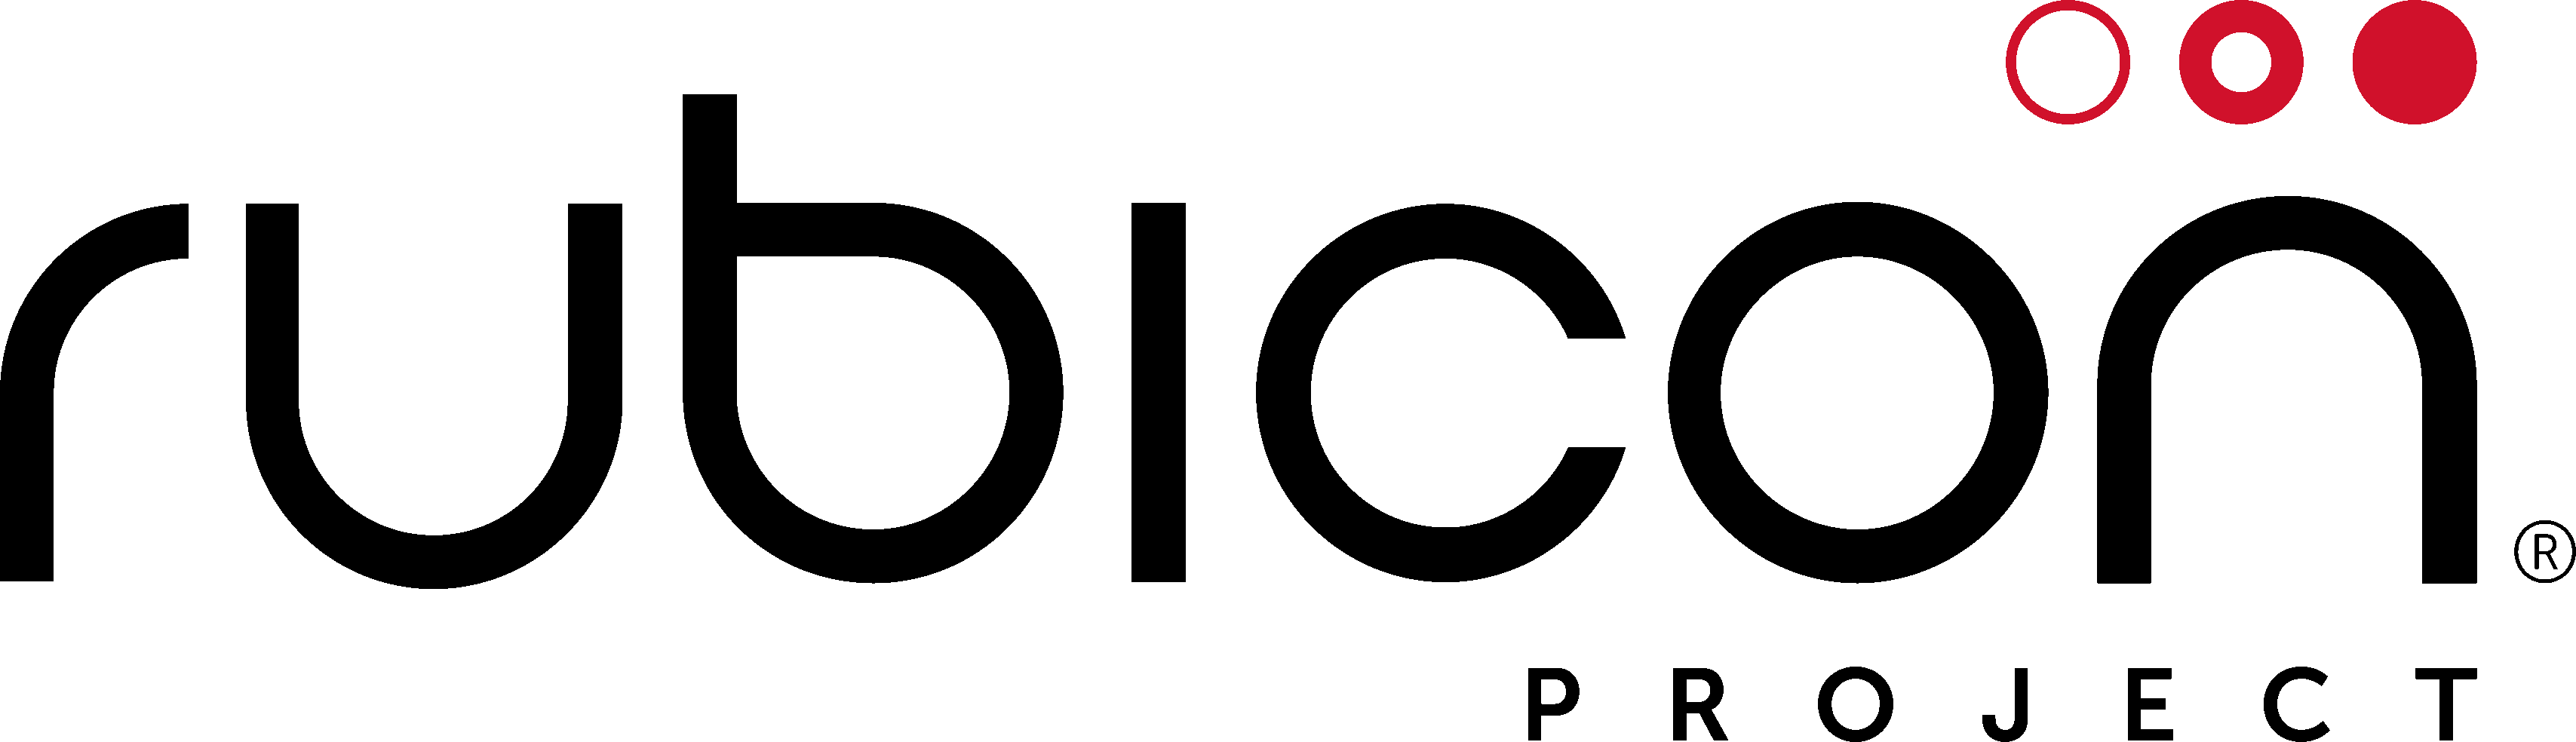 RubiconProject_black (4)